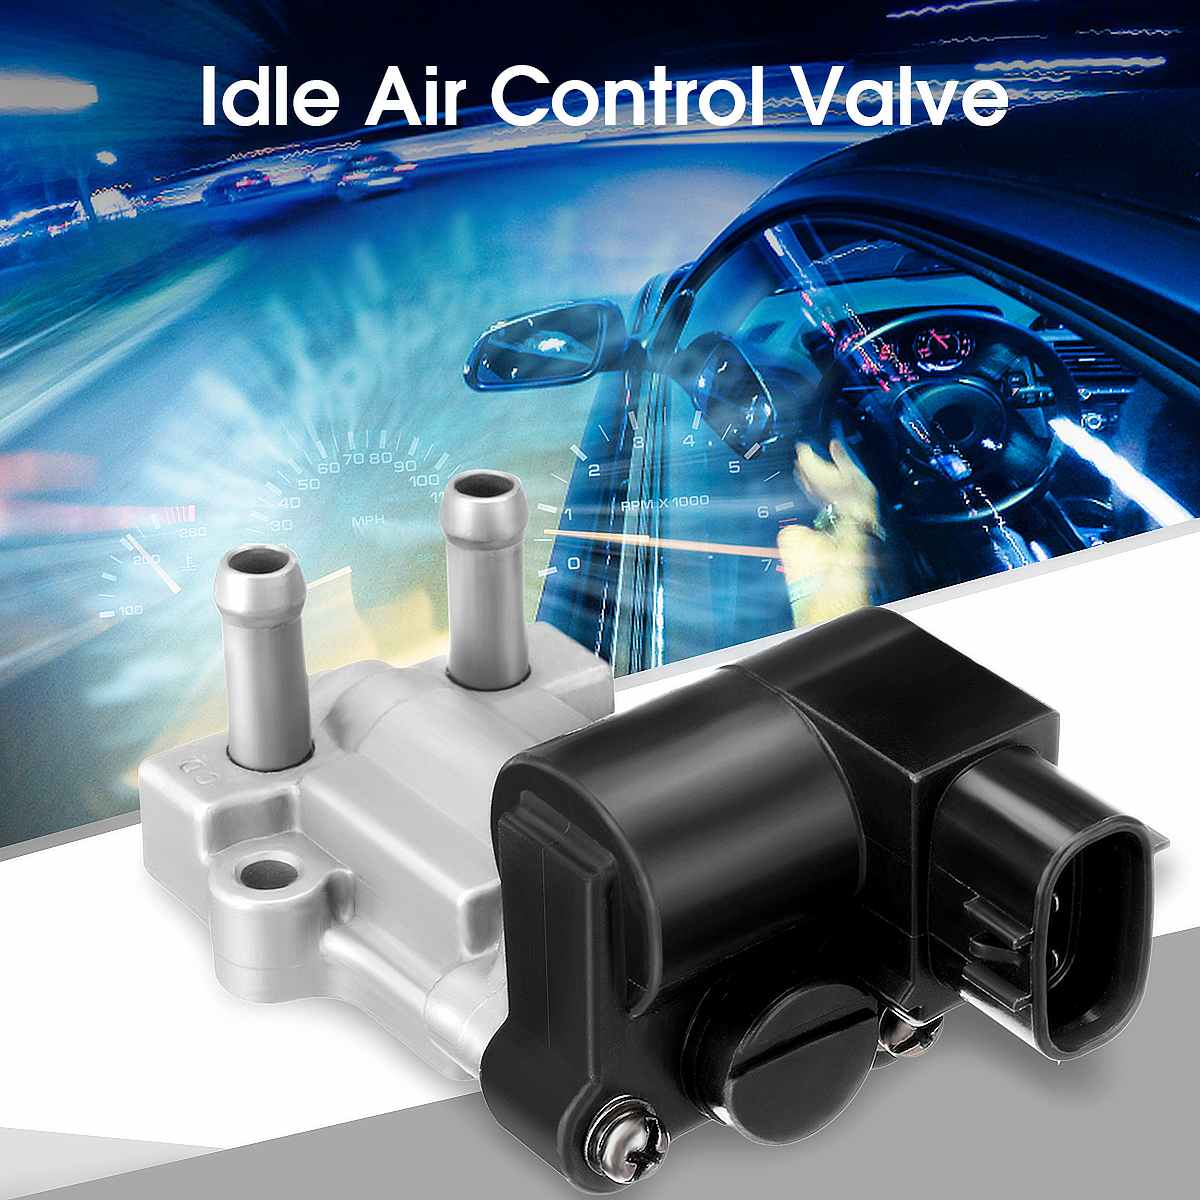 AC188 36450-P28-A01 Idle Air Control Valve For Honda For Civic LX HX EX CX DX GX 1.7L C484 2H1114 AC4211